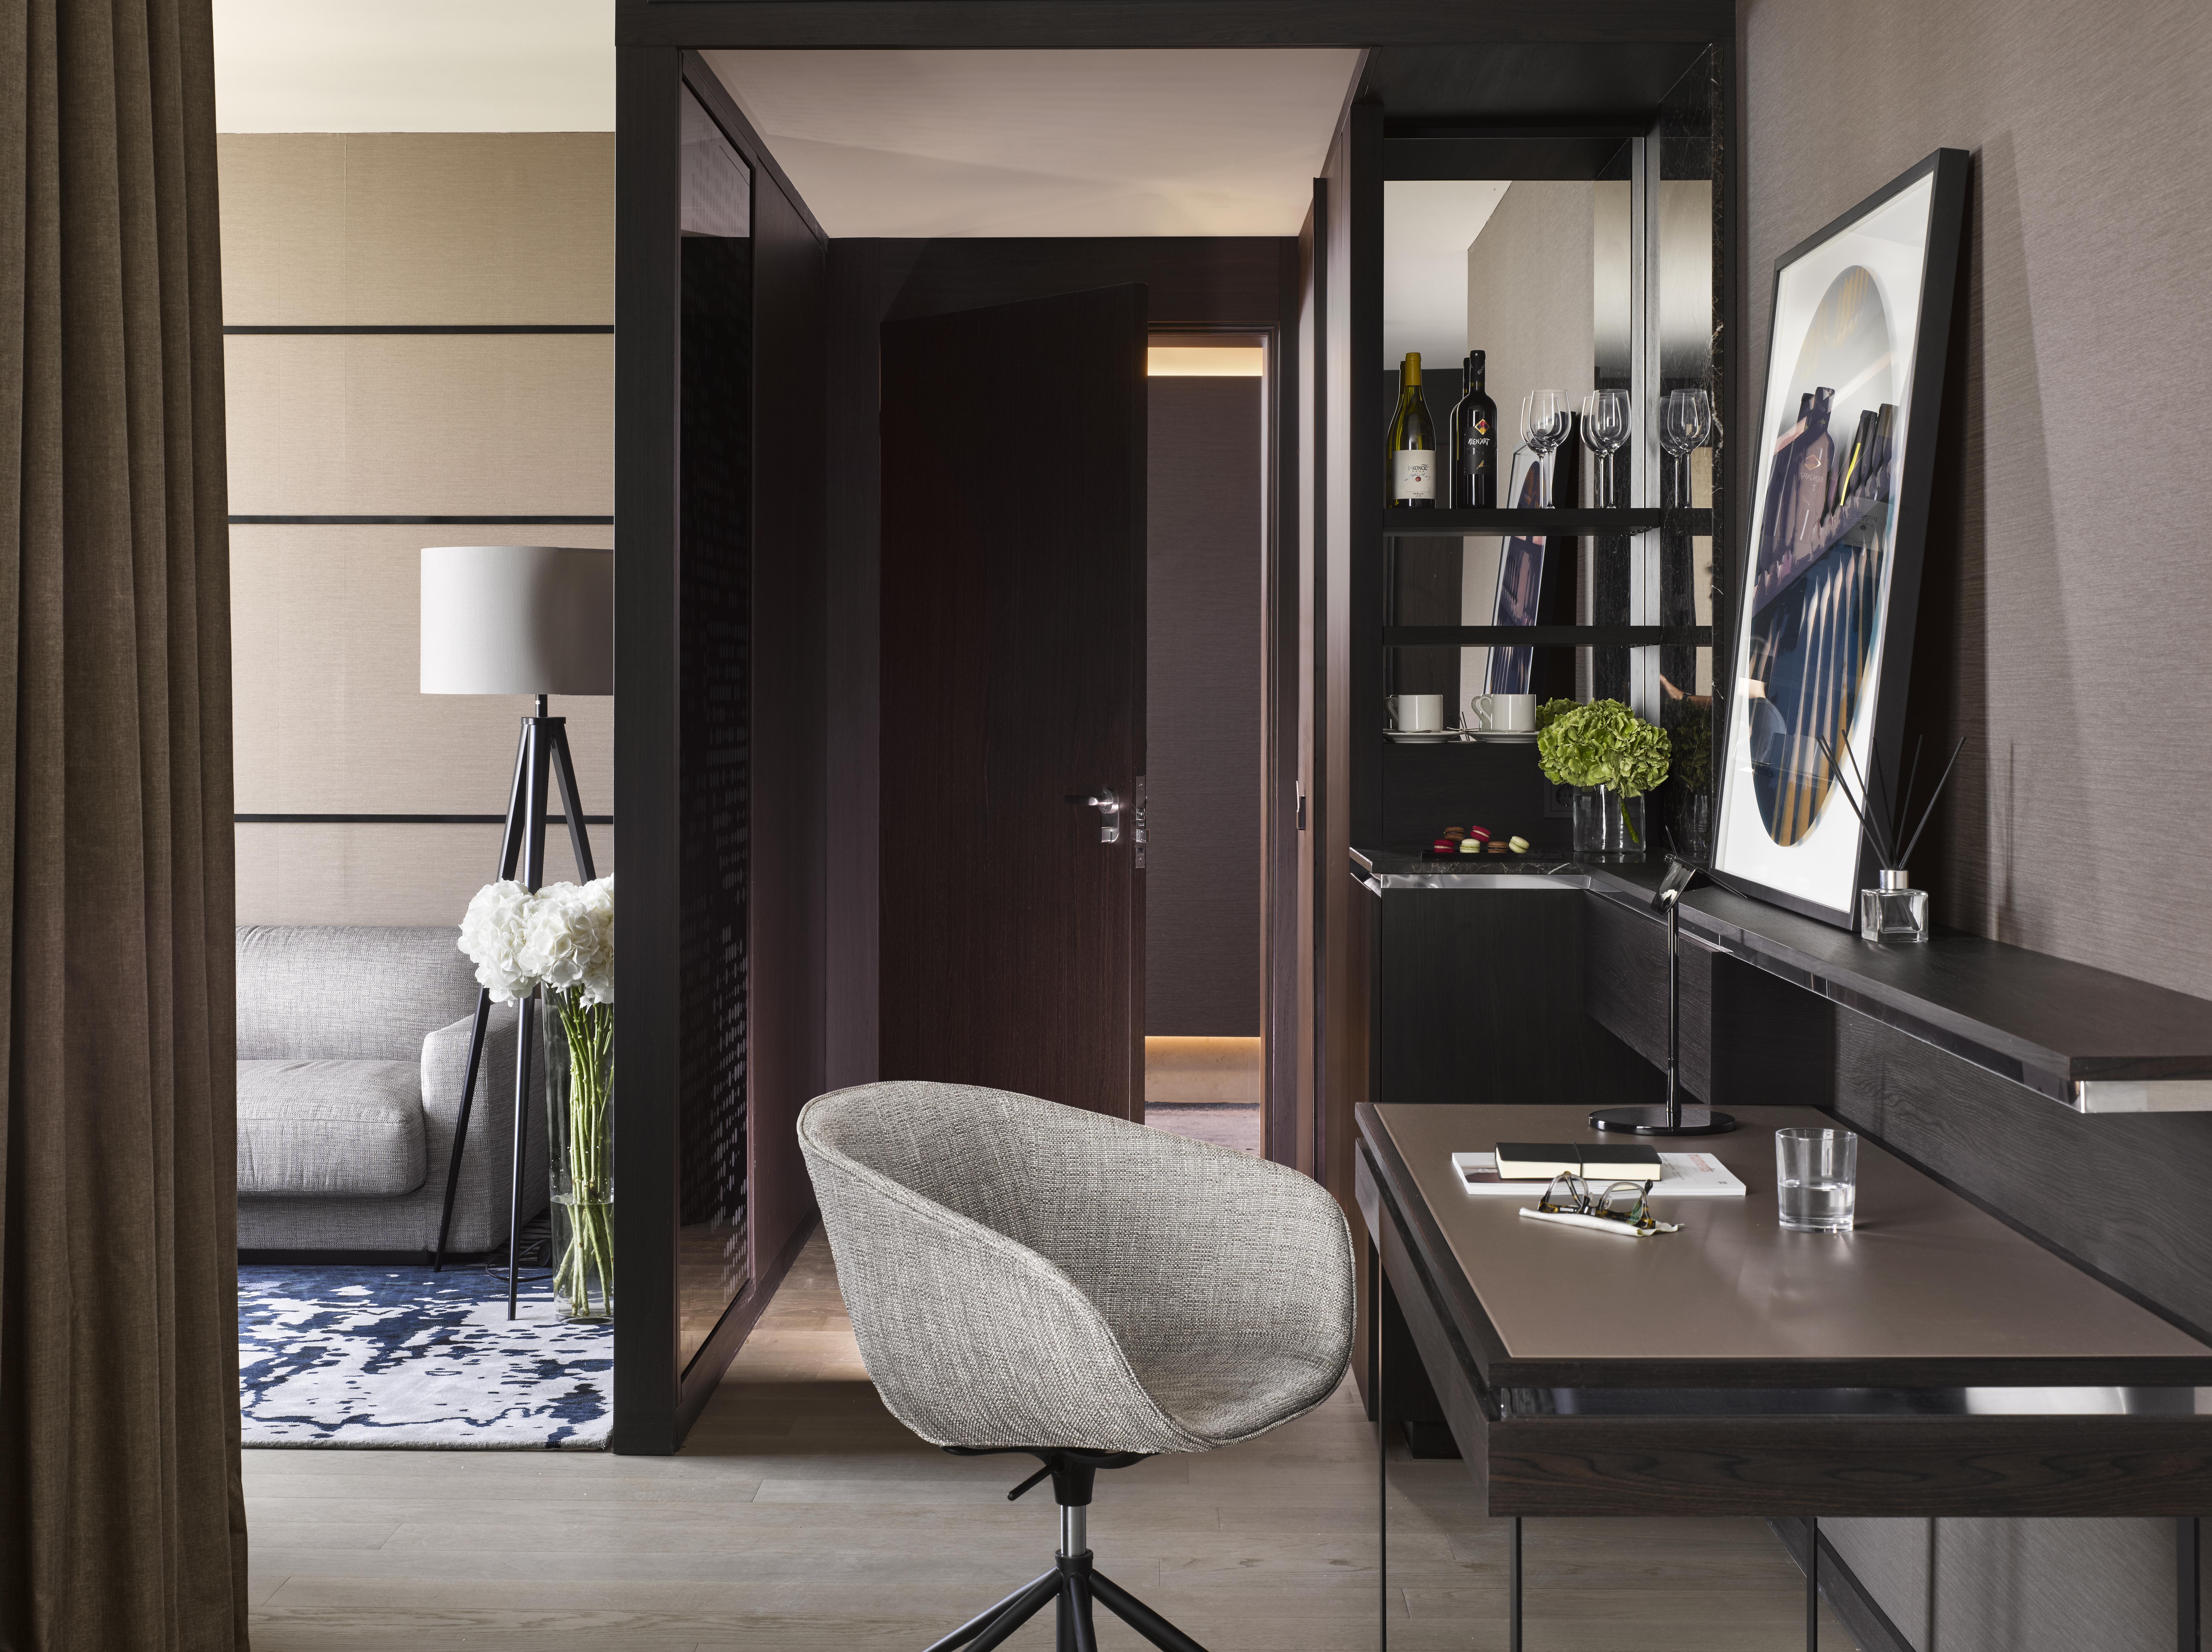 junior-suite-intercontiental-ljubljana-hotel-slovenia